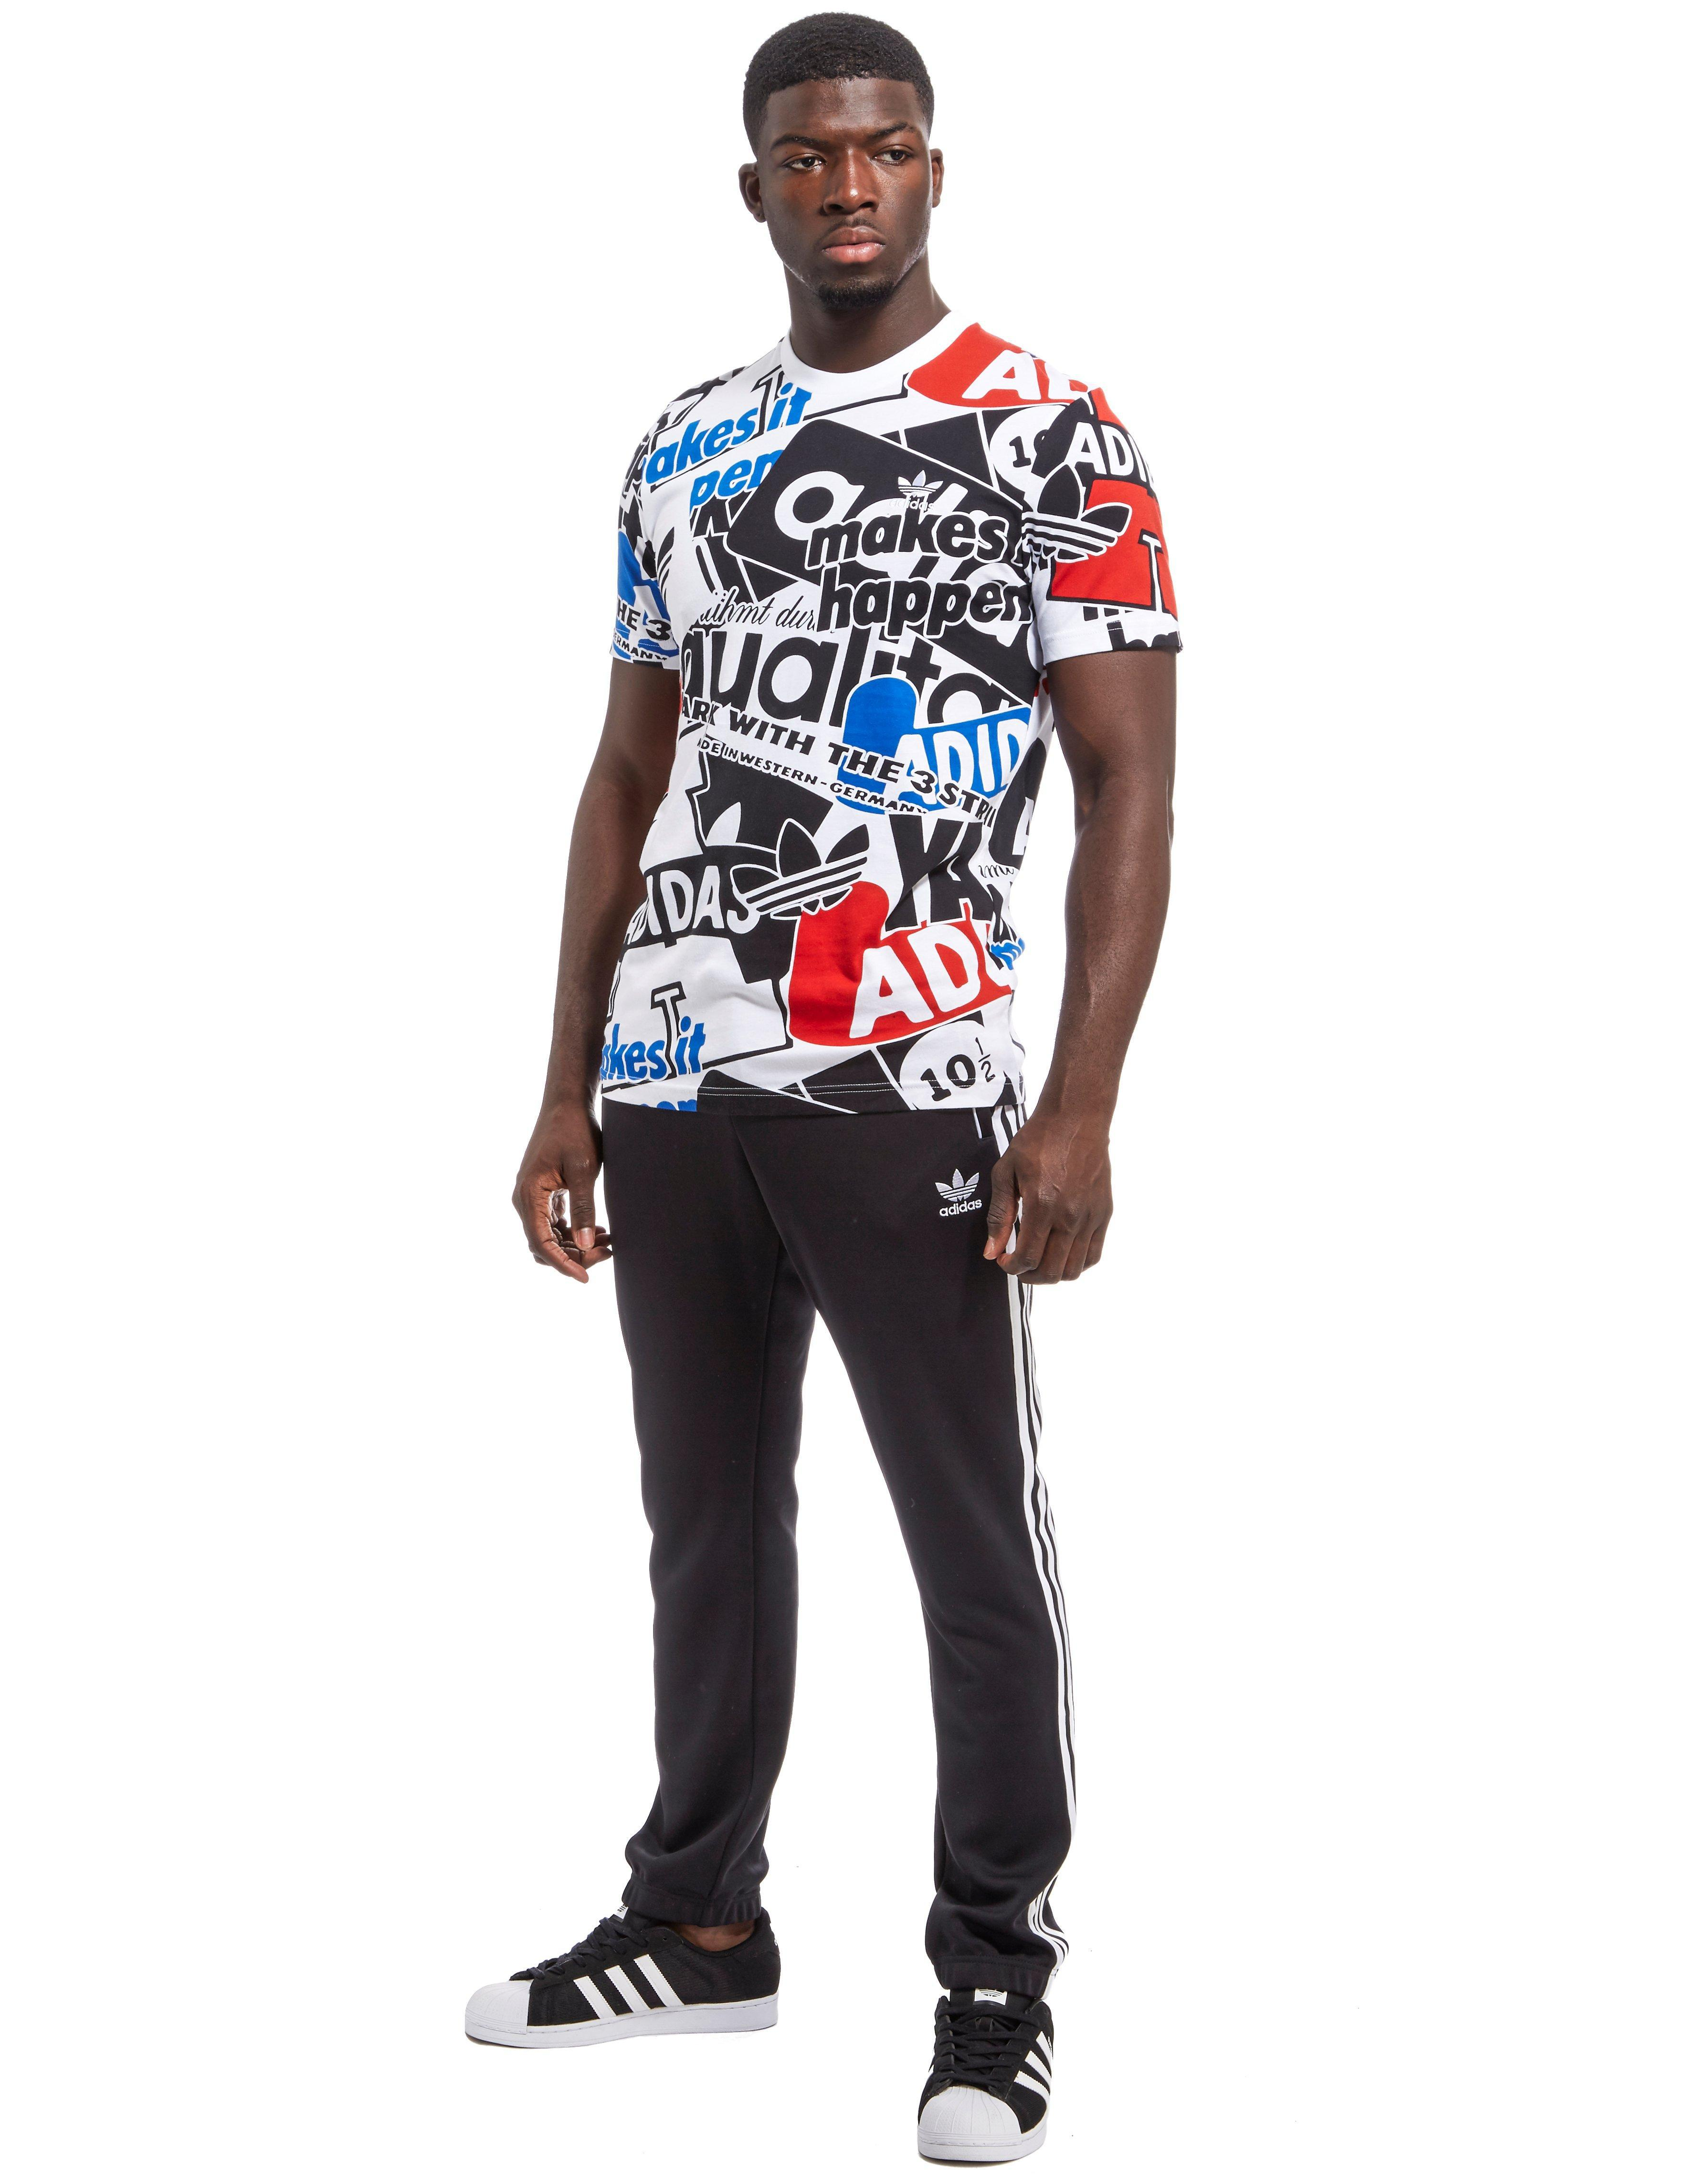 Men's White Loud Aop T shirt